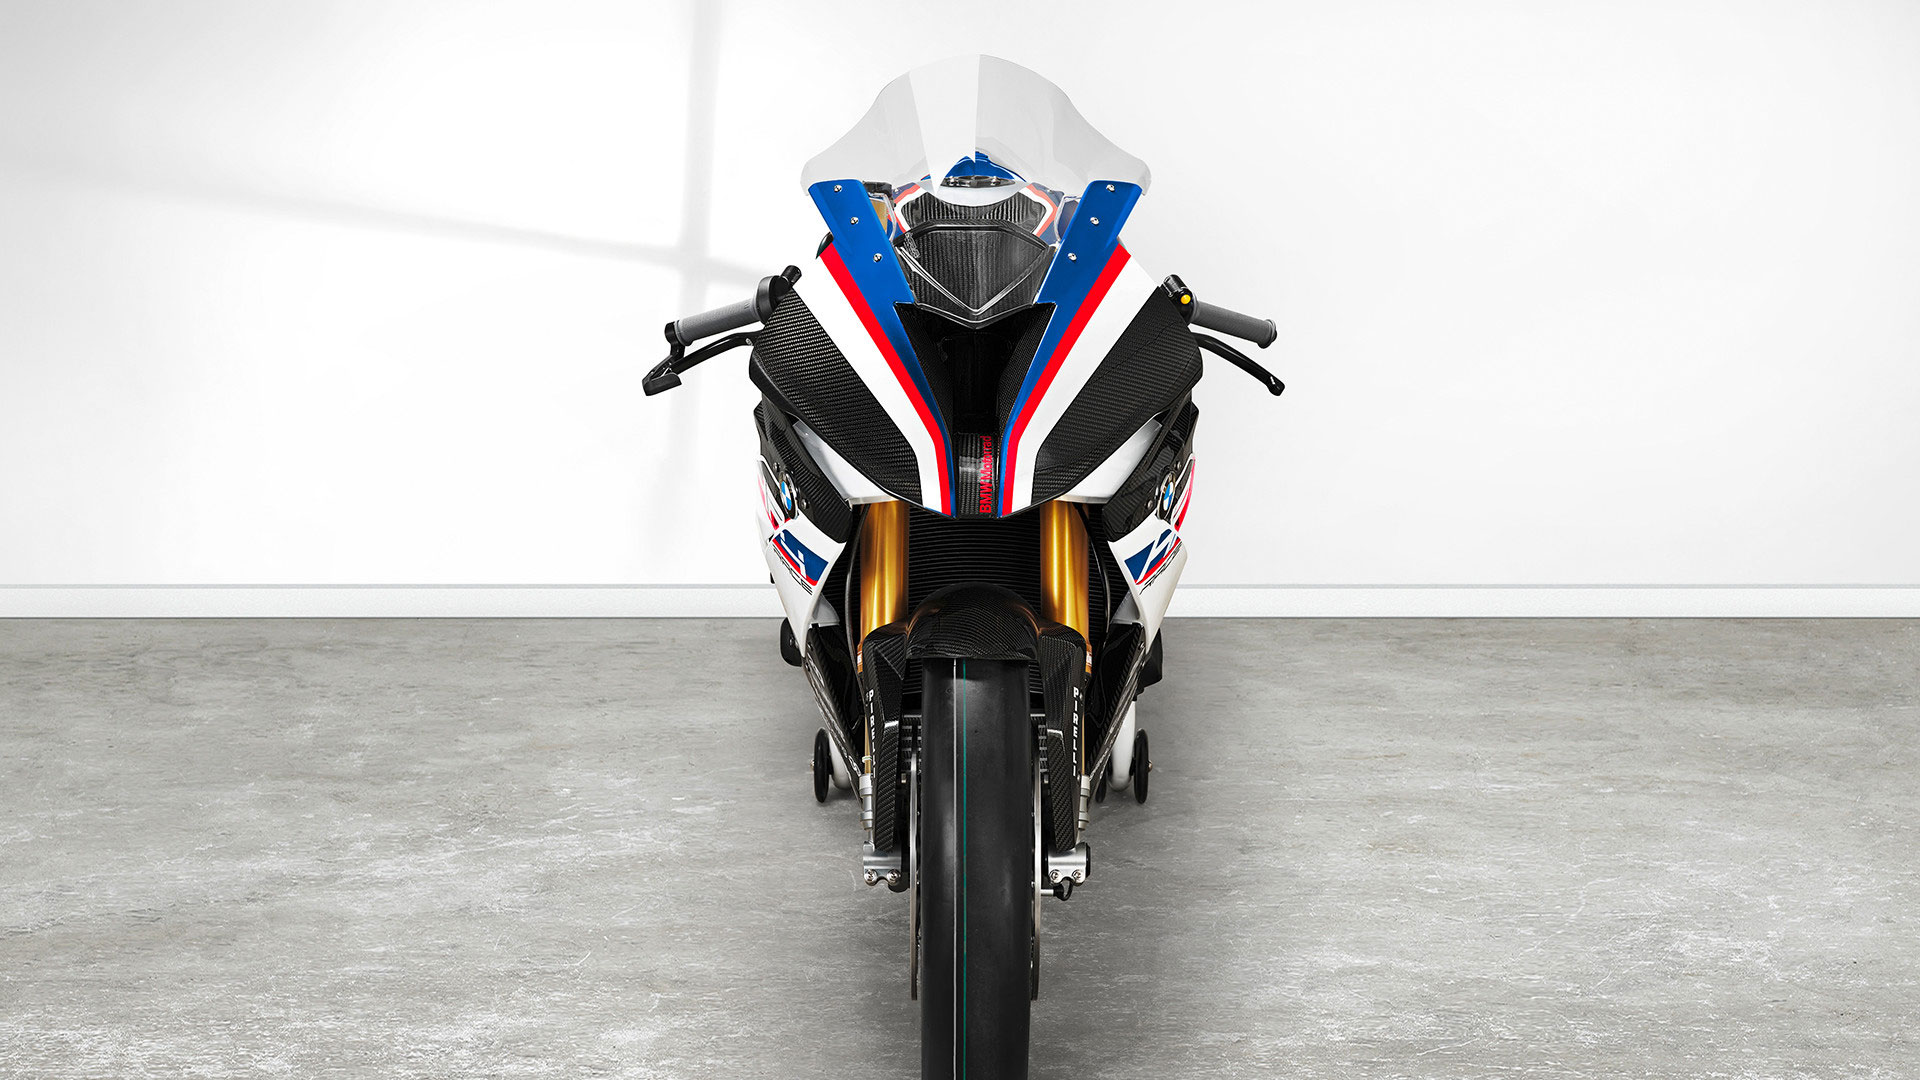 HP4 Race BMW Motorcycles Of Riverside California